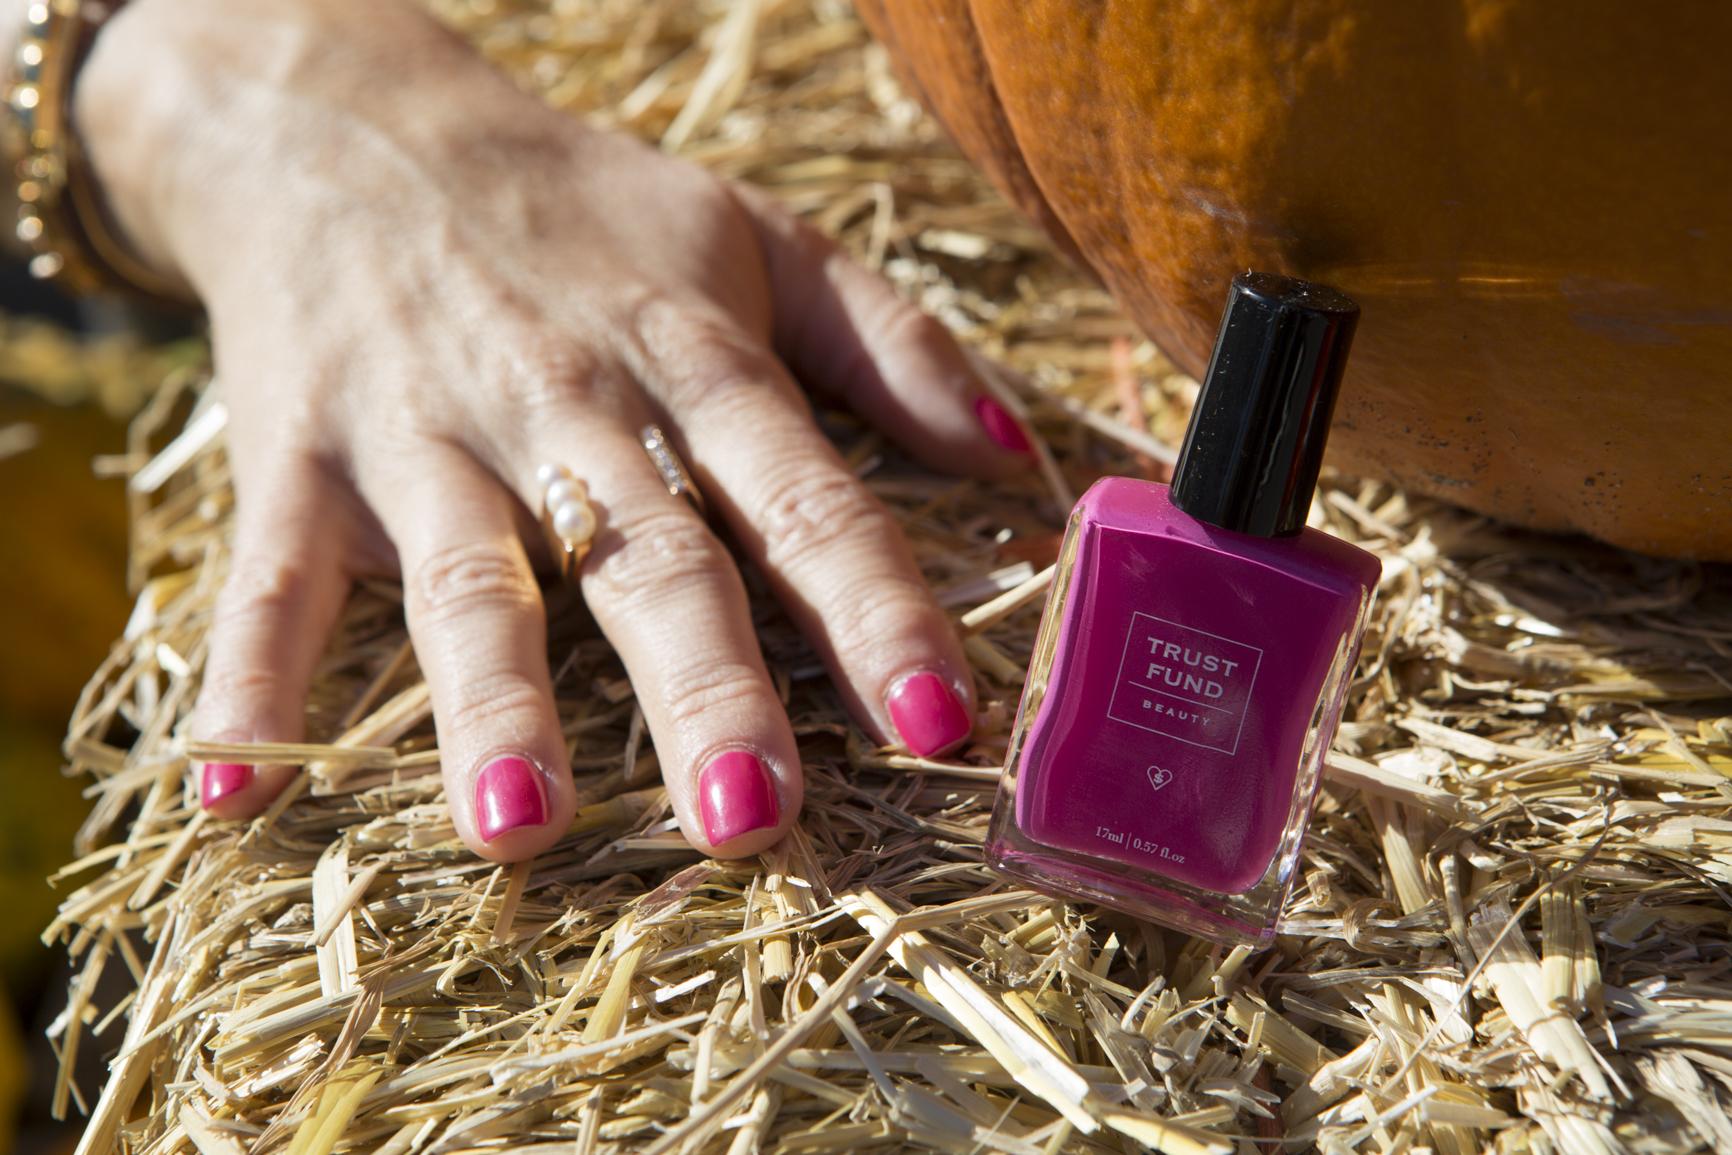 mademoiselle jules trust fund beauty sex tape manicure